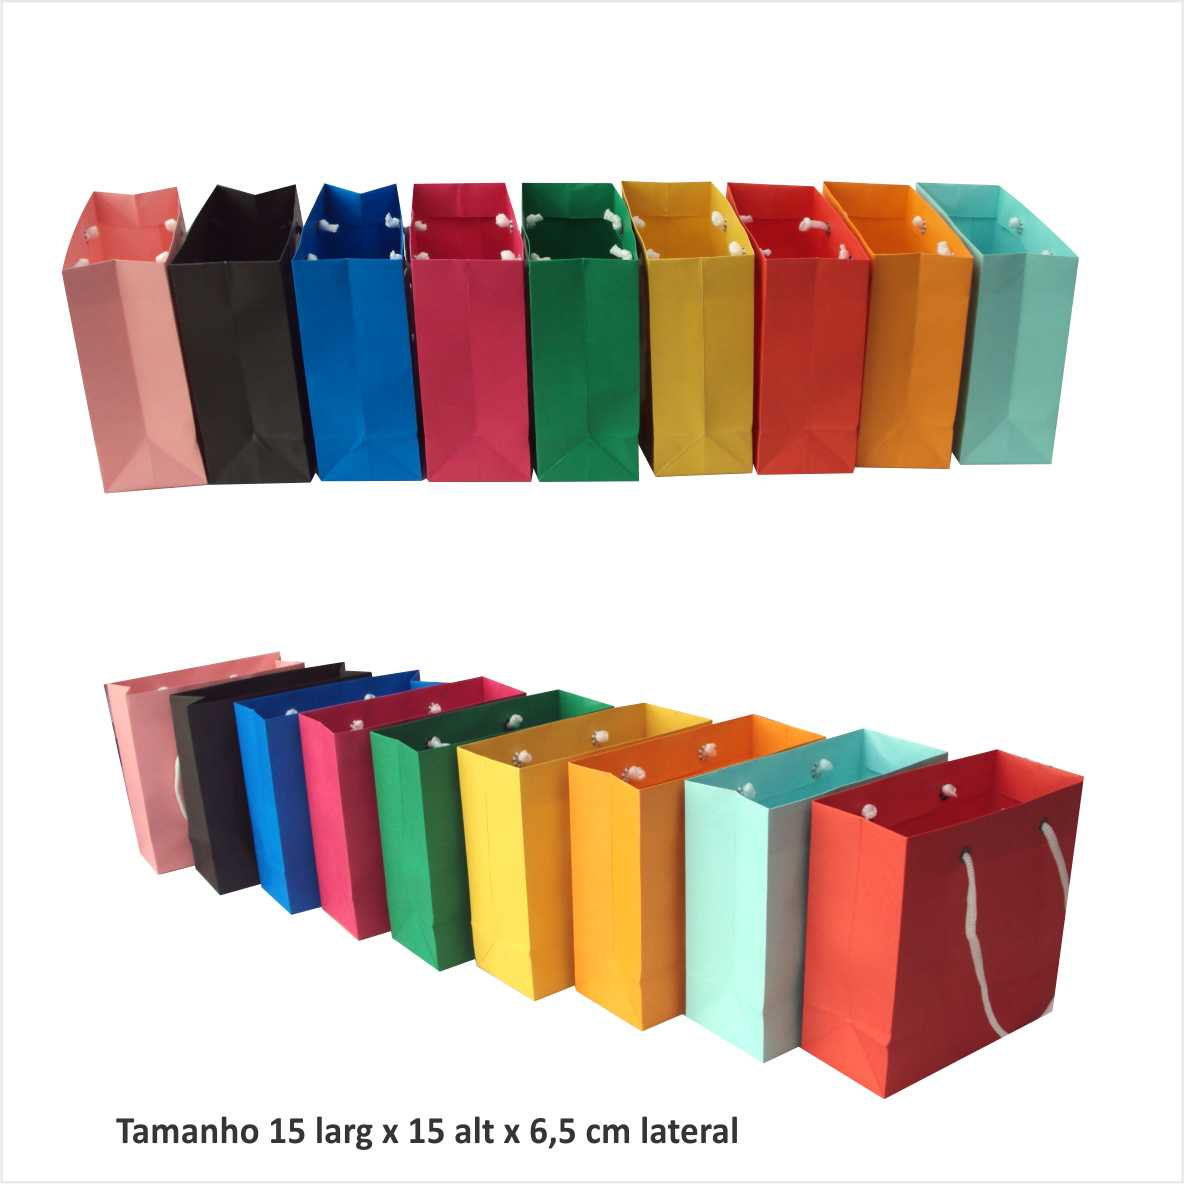 baeb821c2 sacolas de papel coloridas 15x15x6,5 cm no Elo7 | Artesanal Sacolas (367DD)